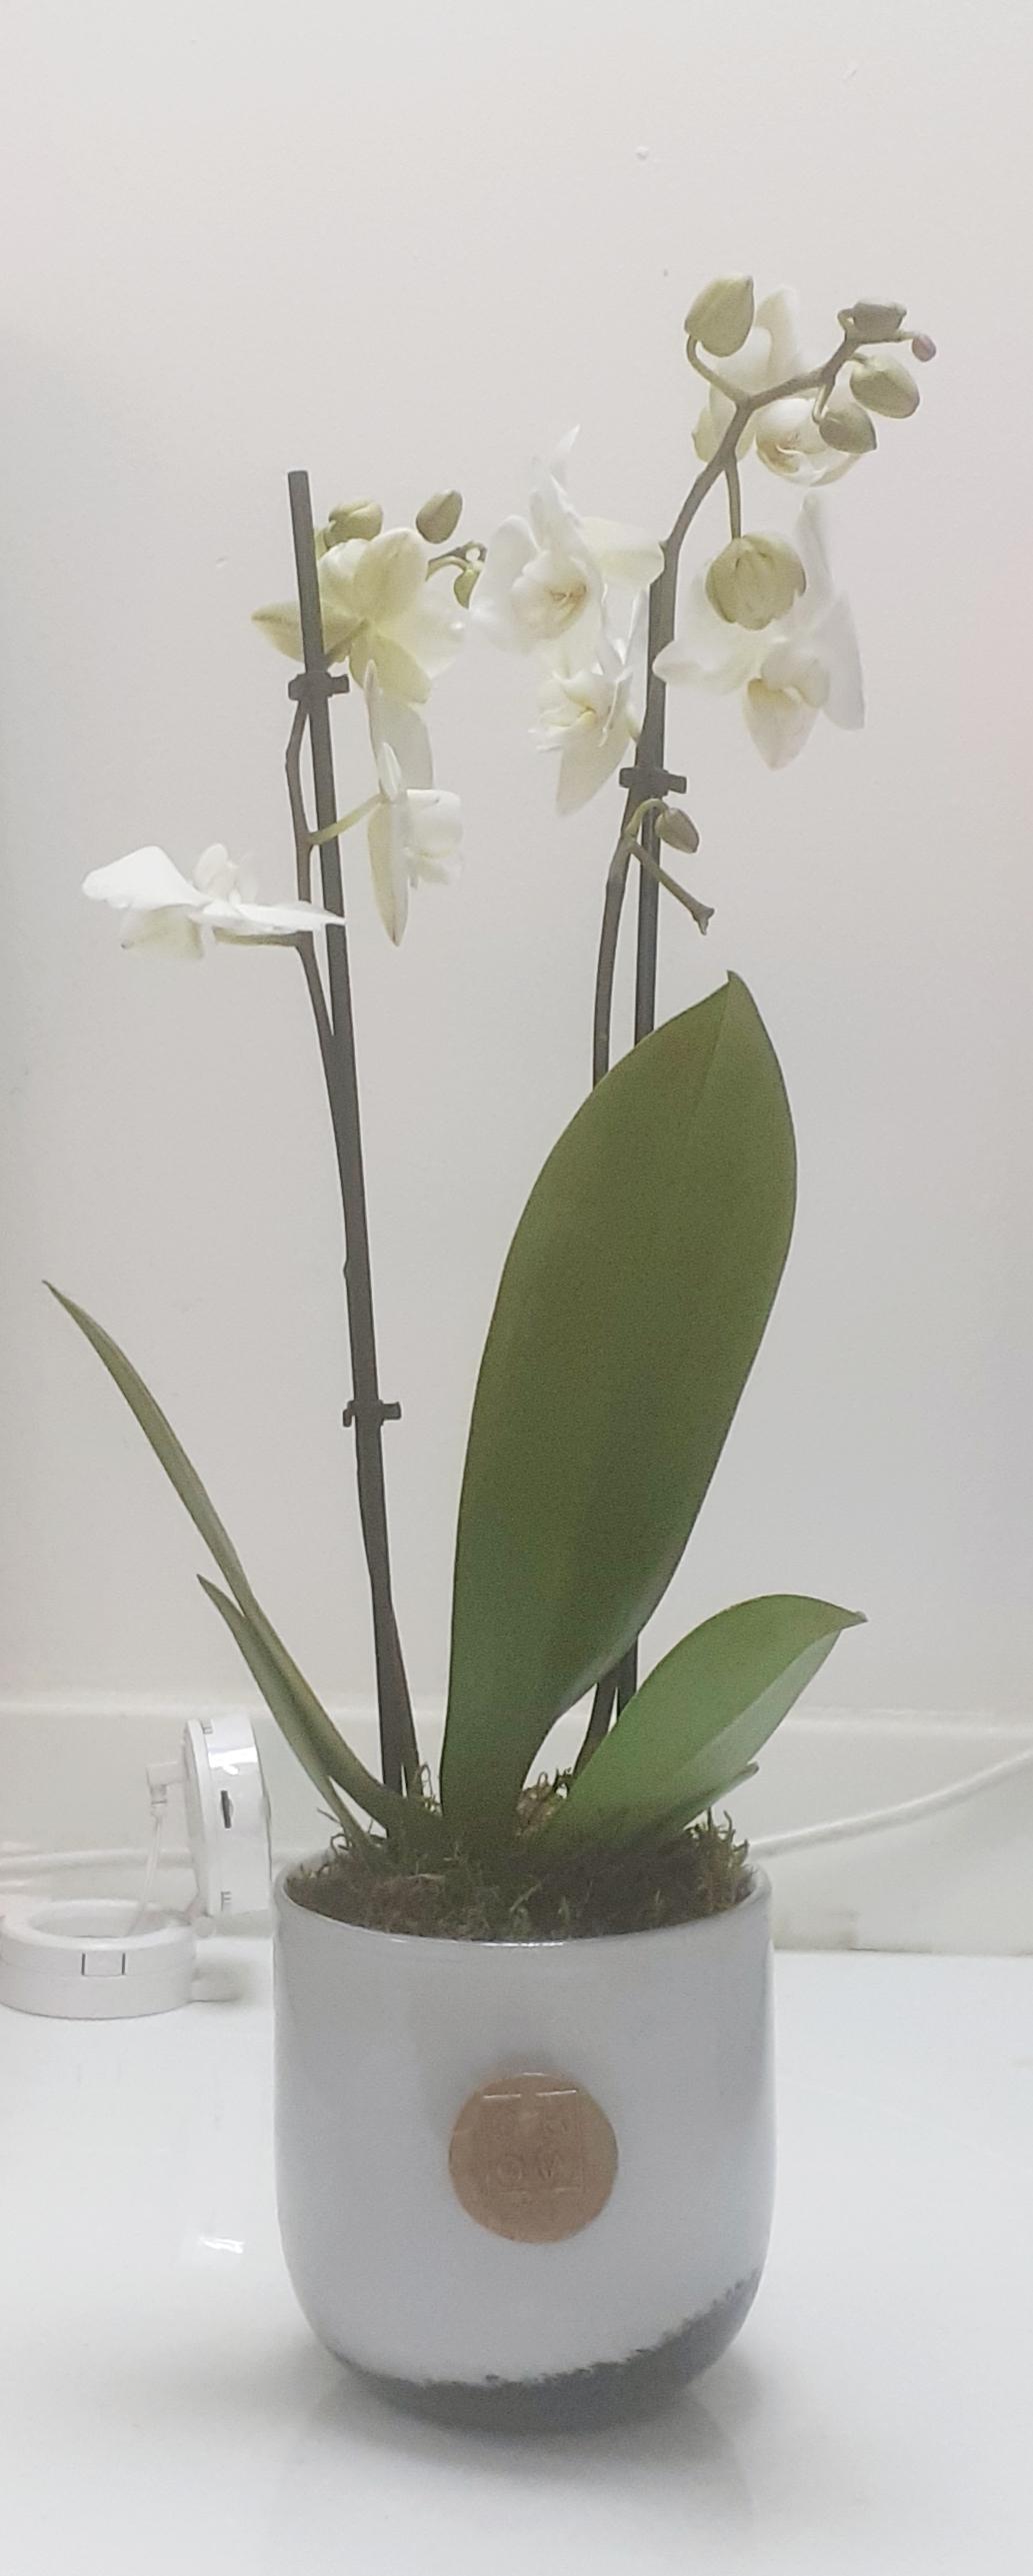 Mini Orchid 2 Office Plants